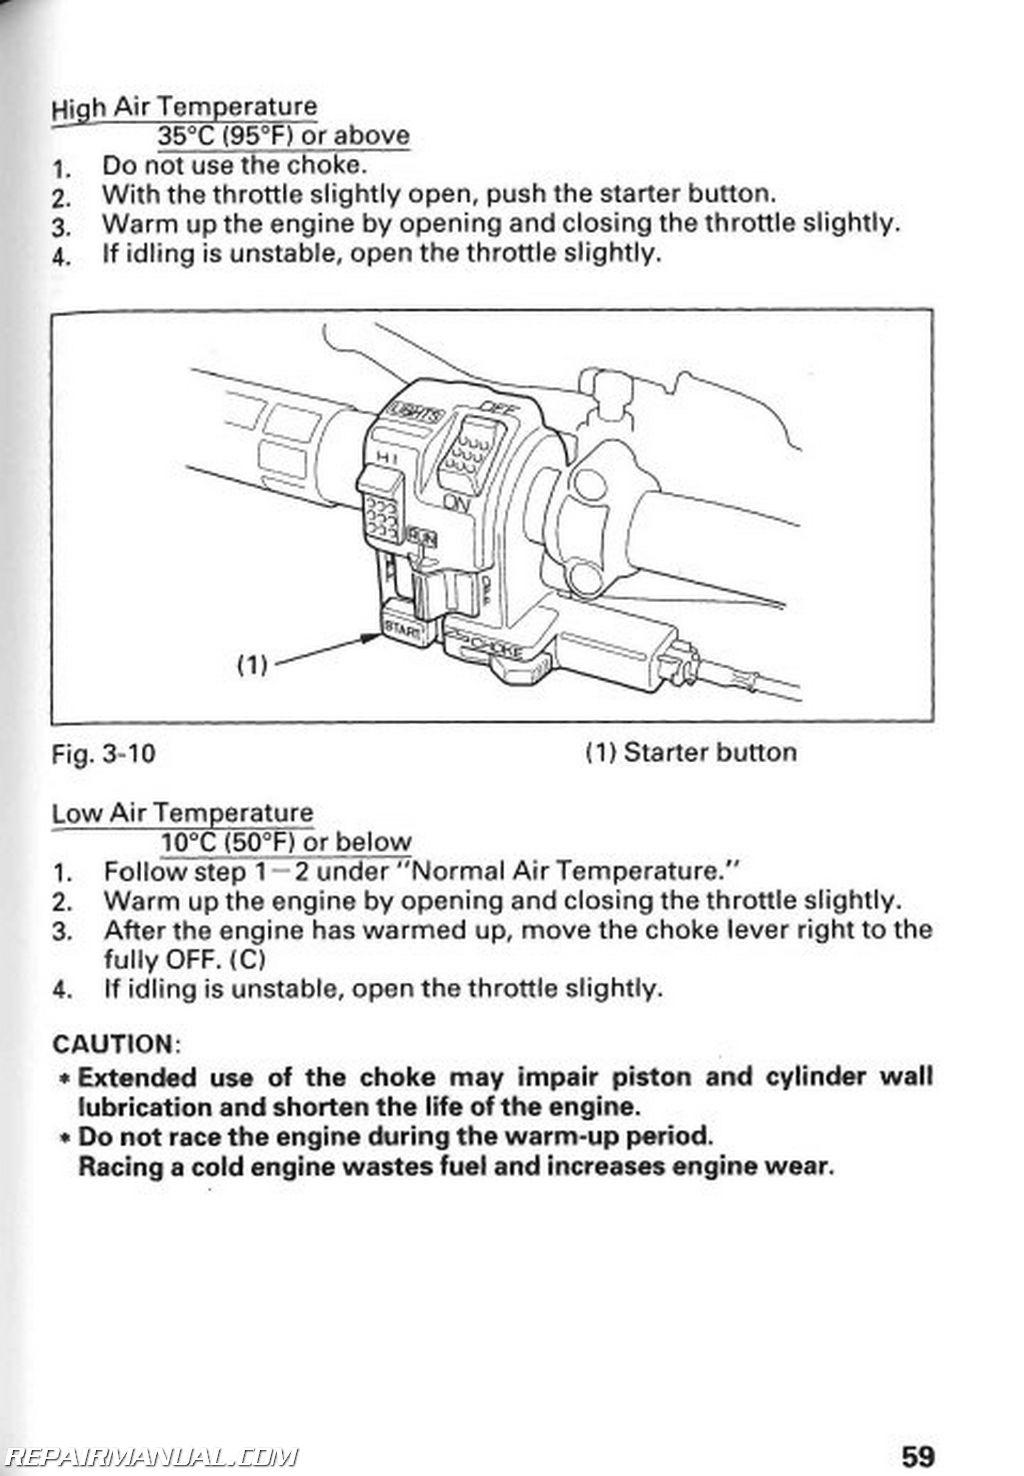 honda motorcycle wiring diagram xl100 plete dual battery ford e350 1996 trx300fw fourtrax 4 x atv owners manual